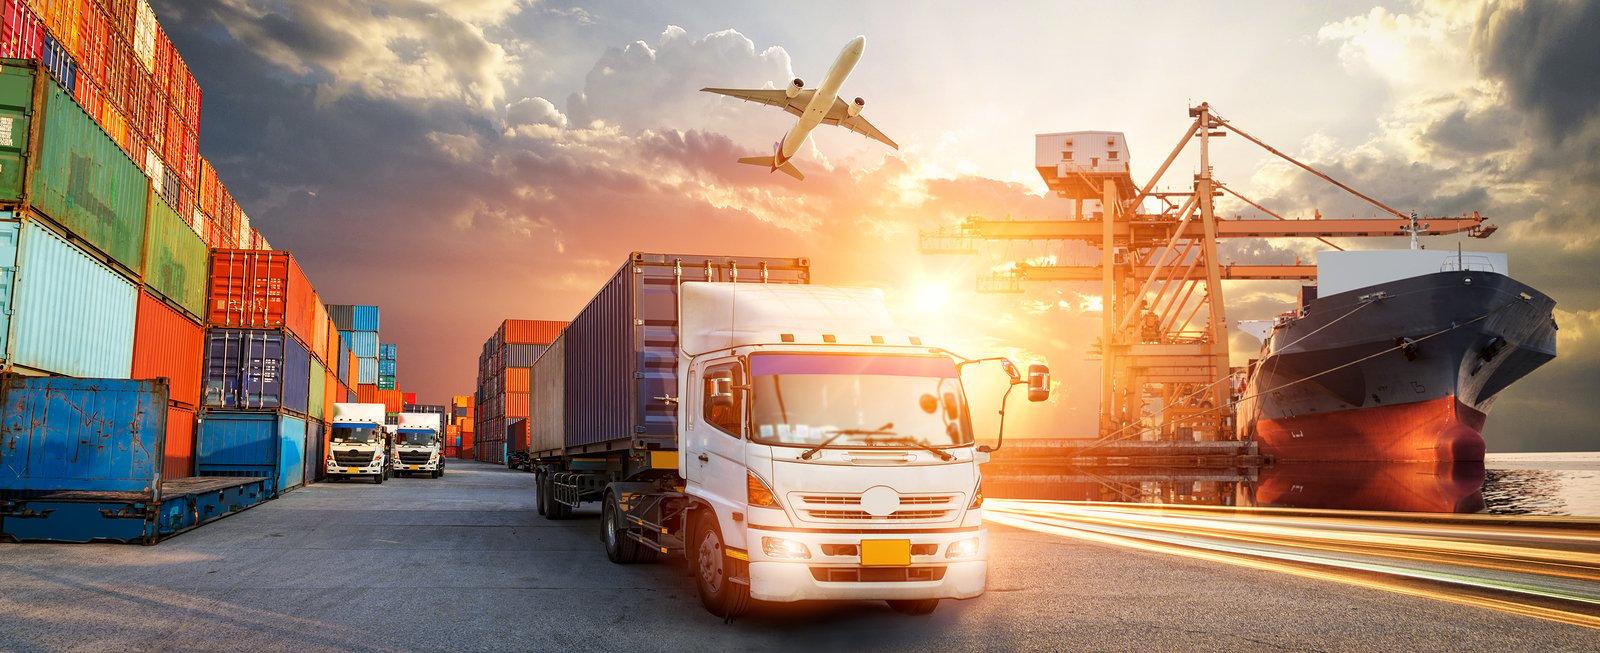 bigstock-Container-Truck-In-Ship-Port-F-330176833